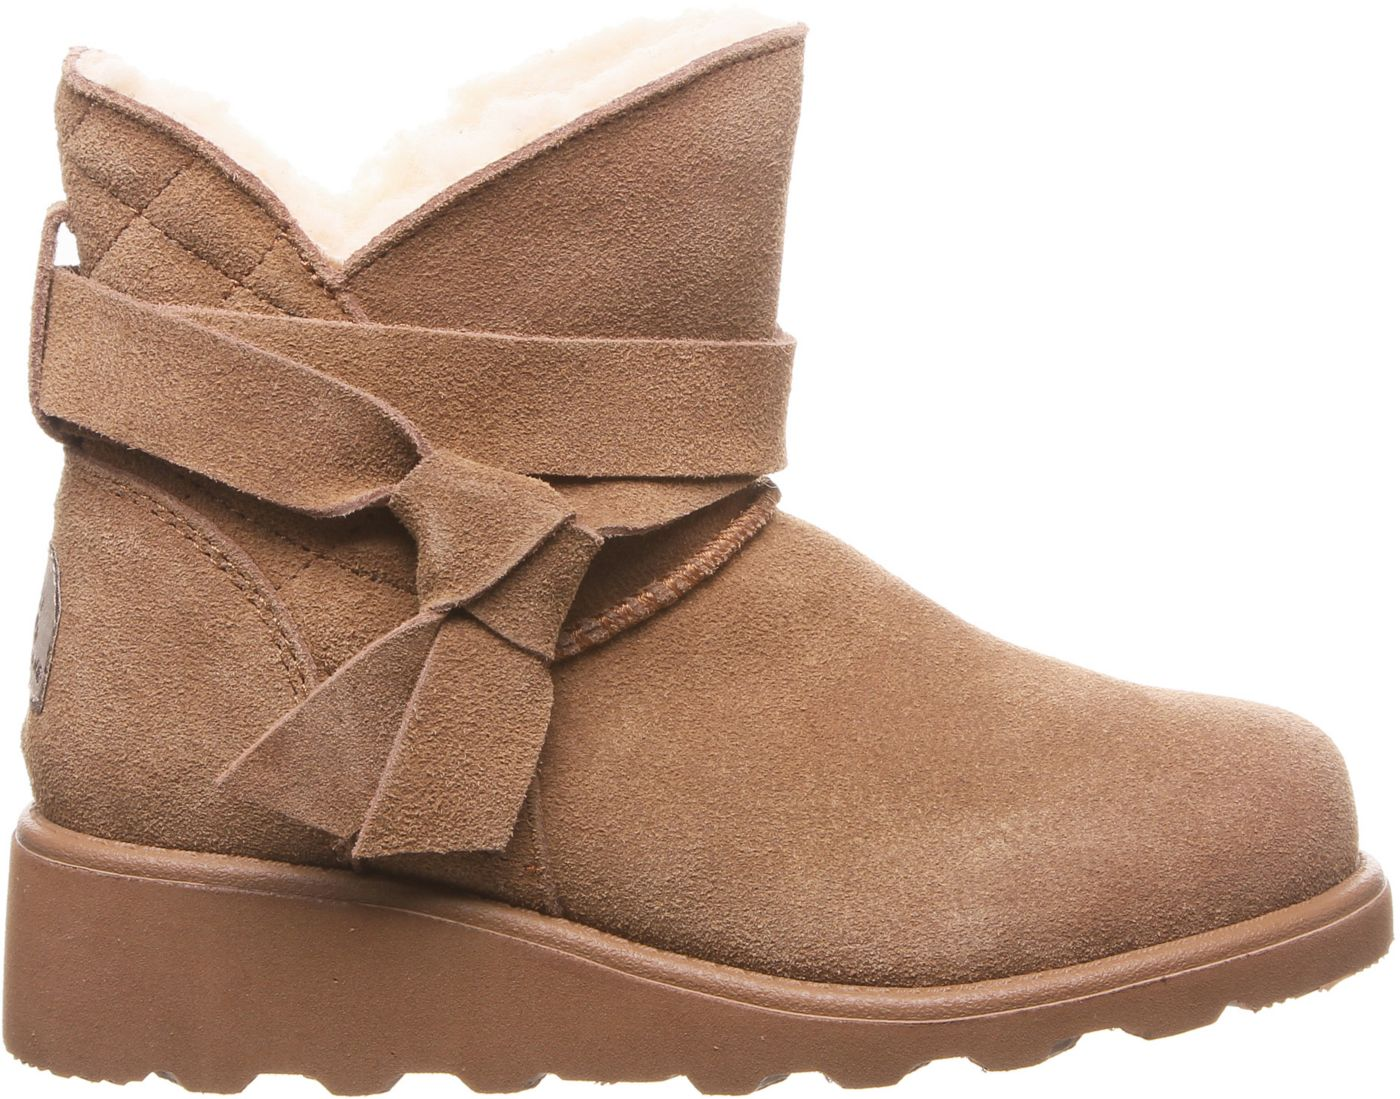 BEARPAW Kids' Maxine Winter Boots